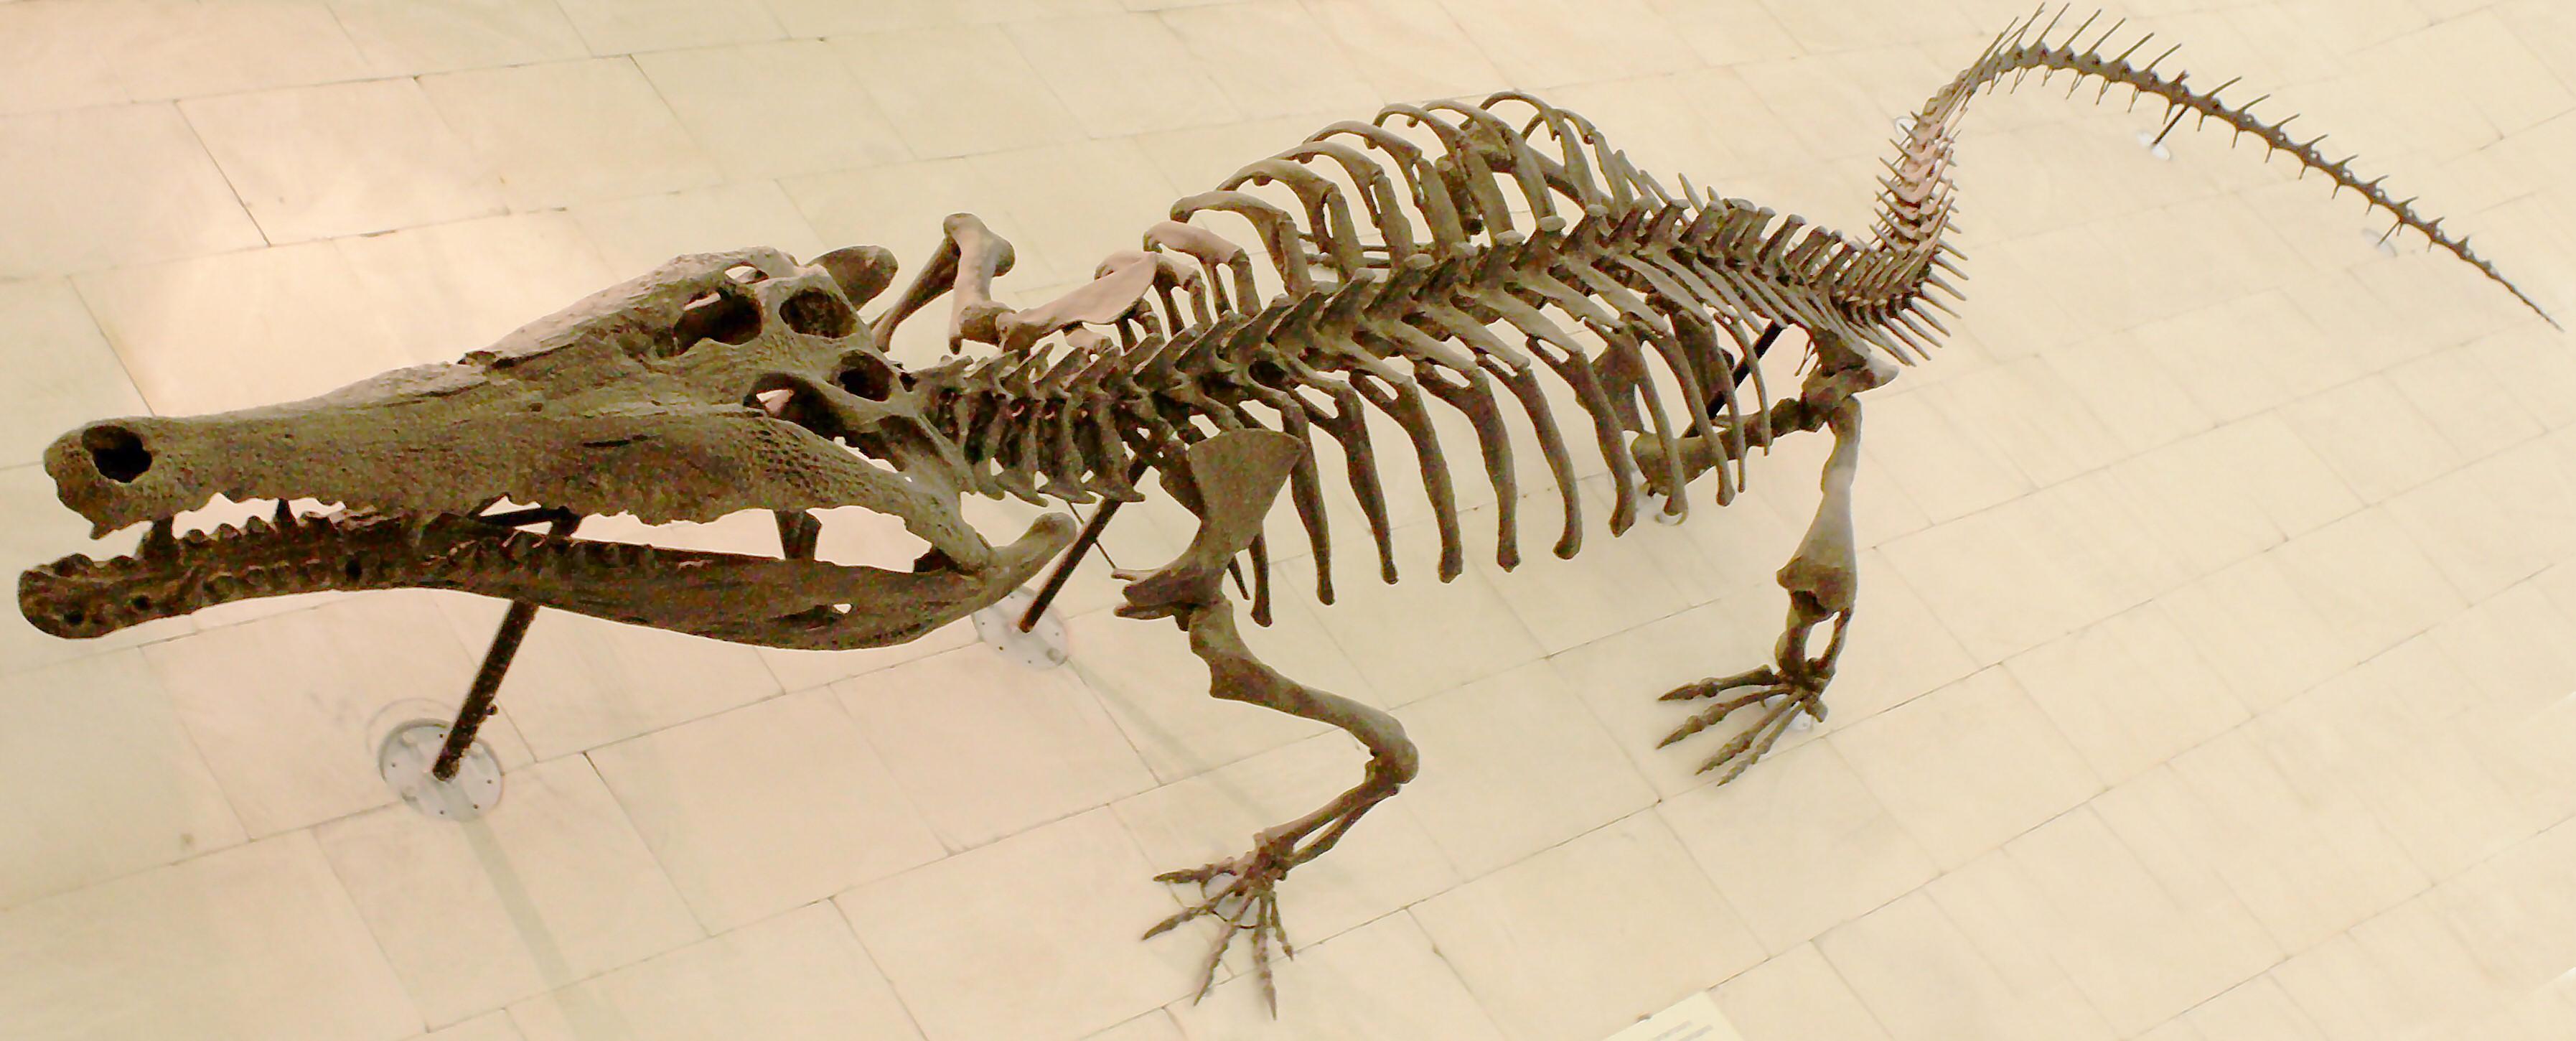 Crocodile skeleton - photo#5